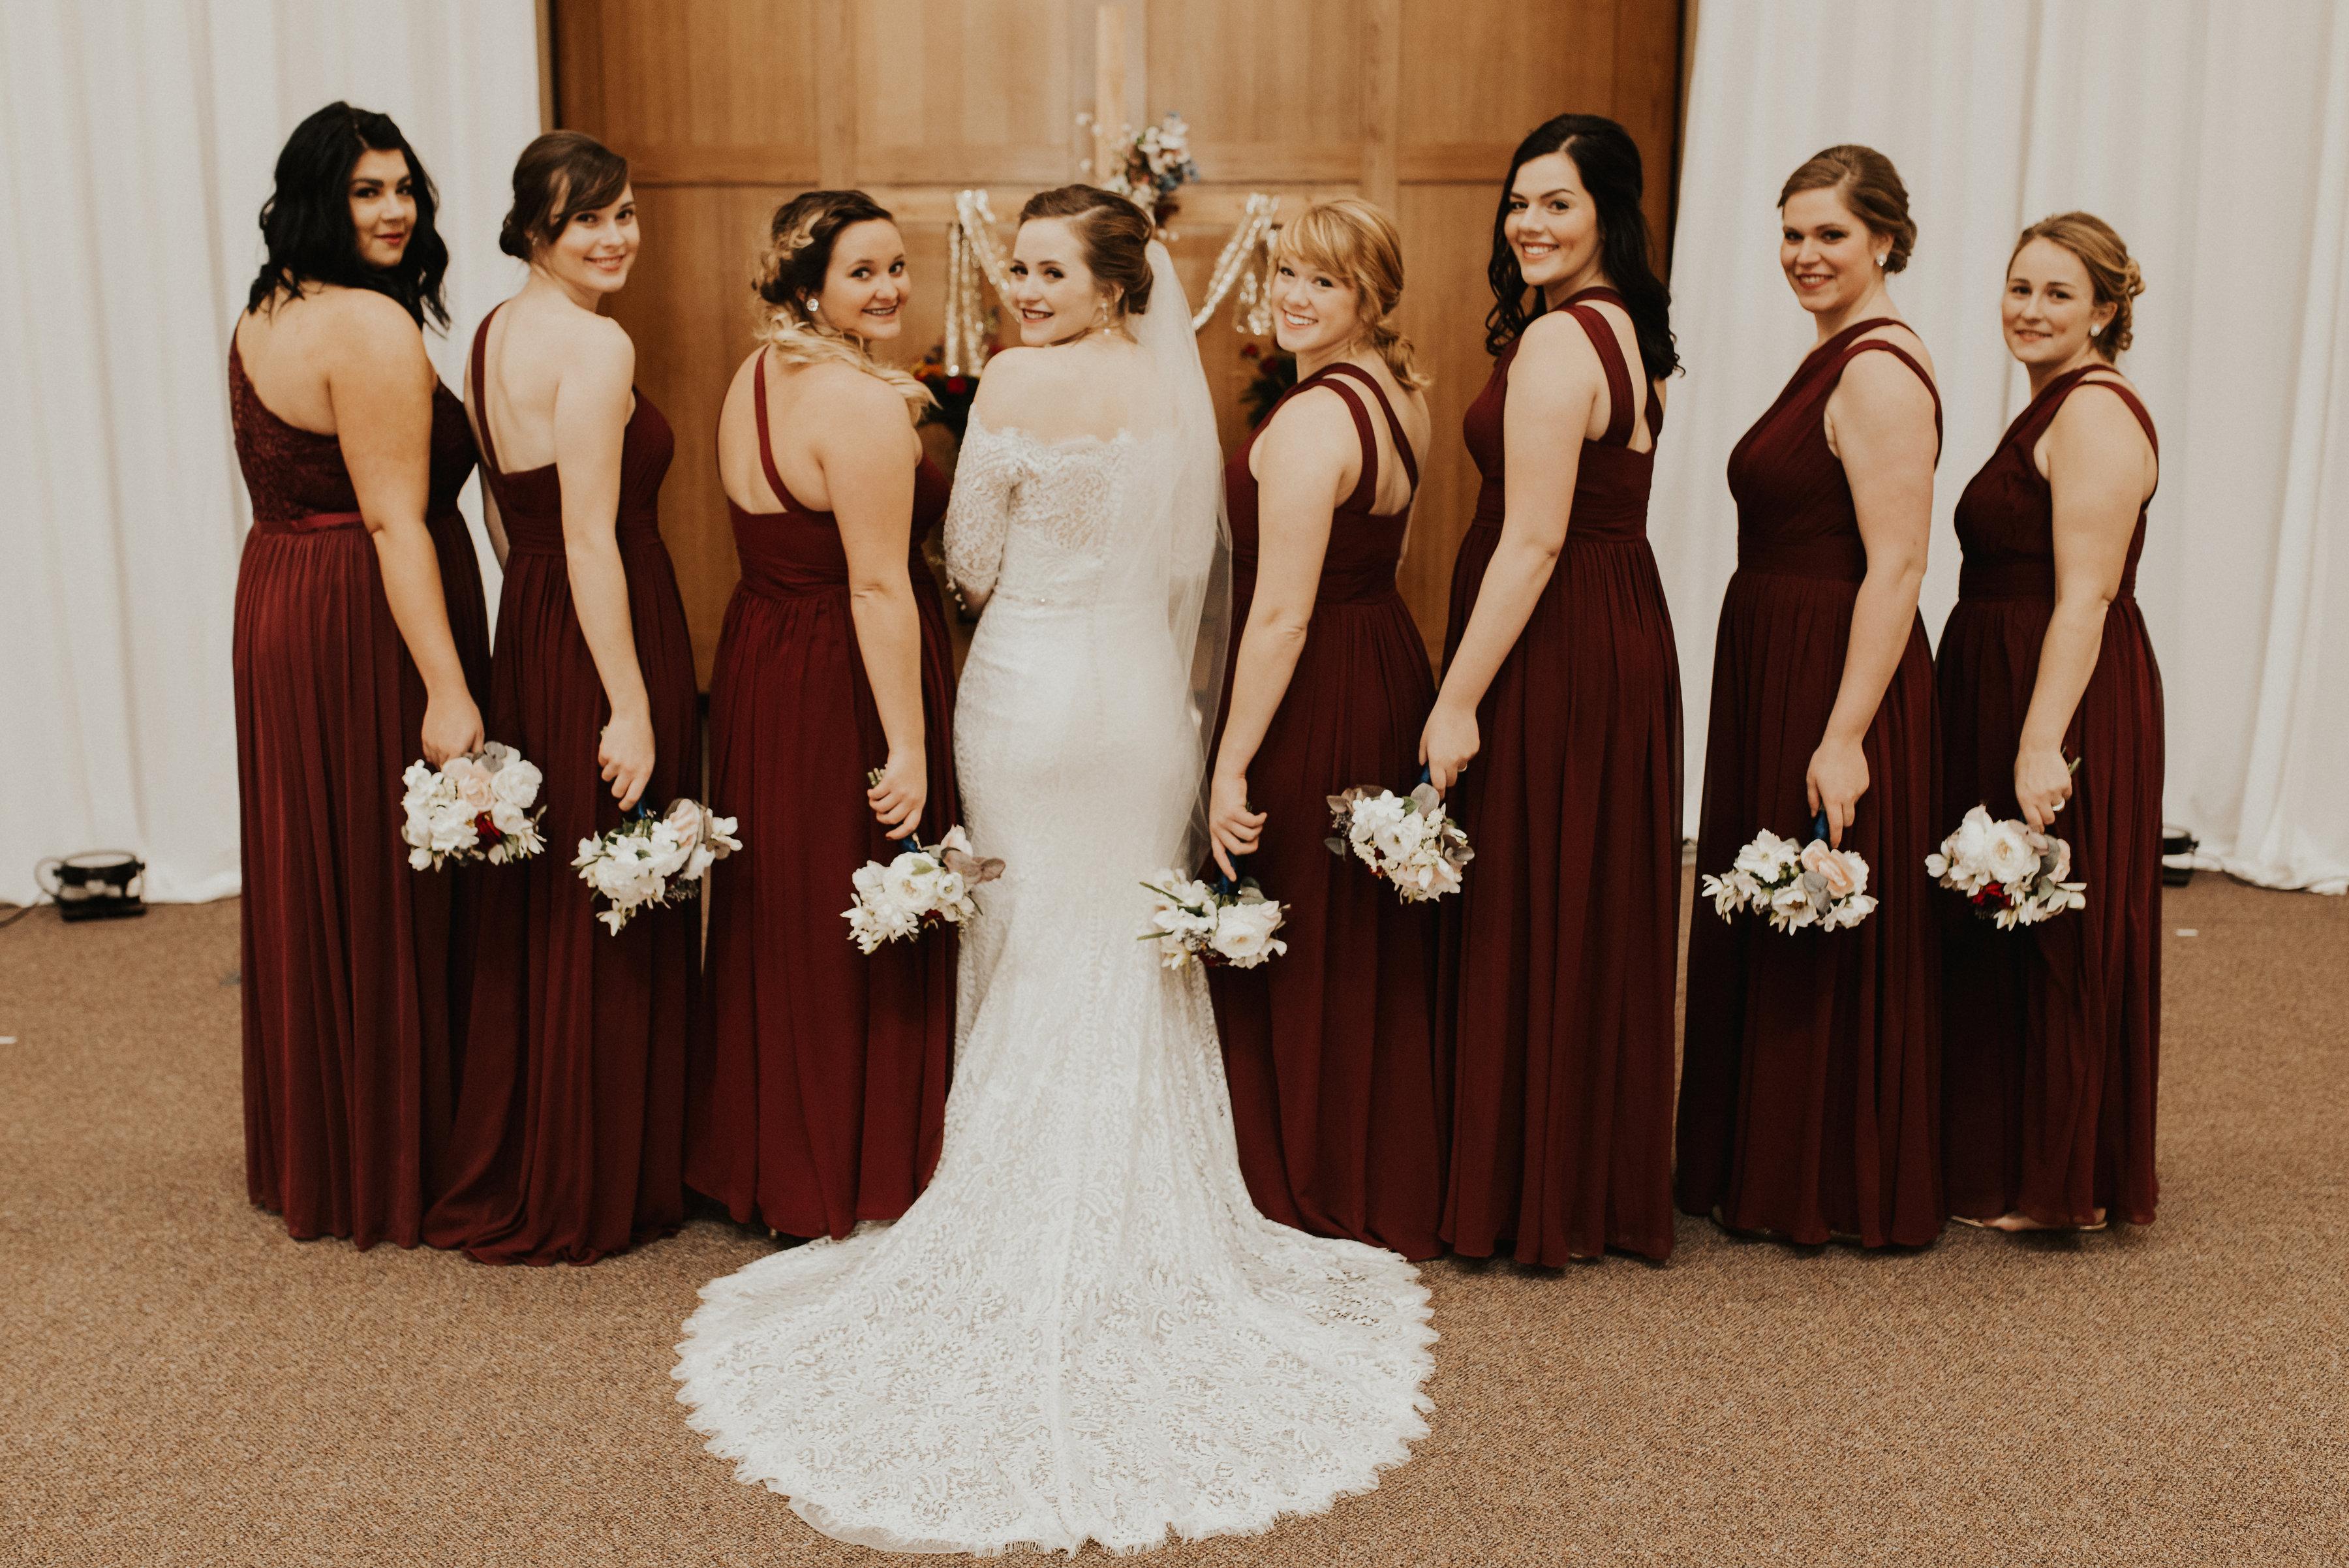 ac66f4c1b4 Azazie Molly Bridesmaid Dress - Wisteria